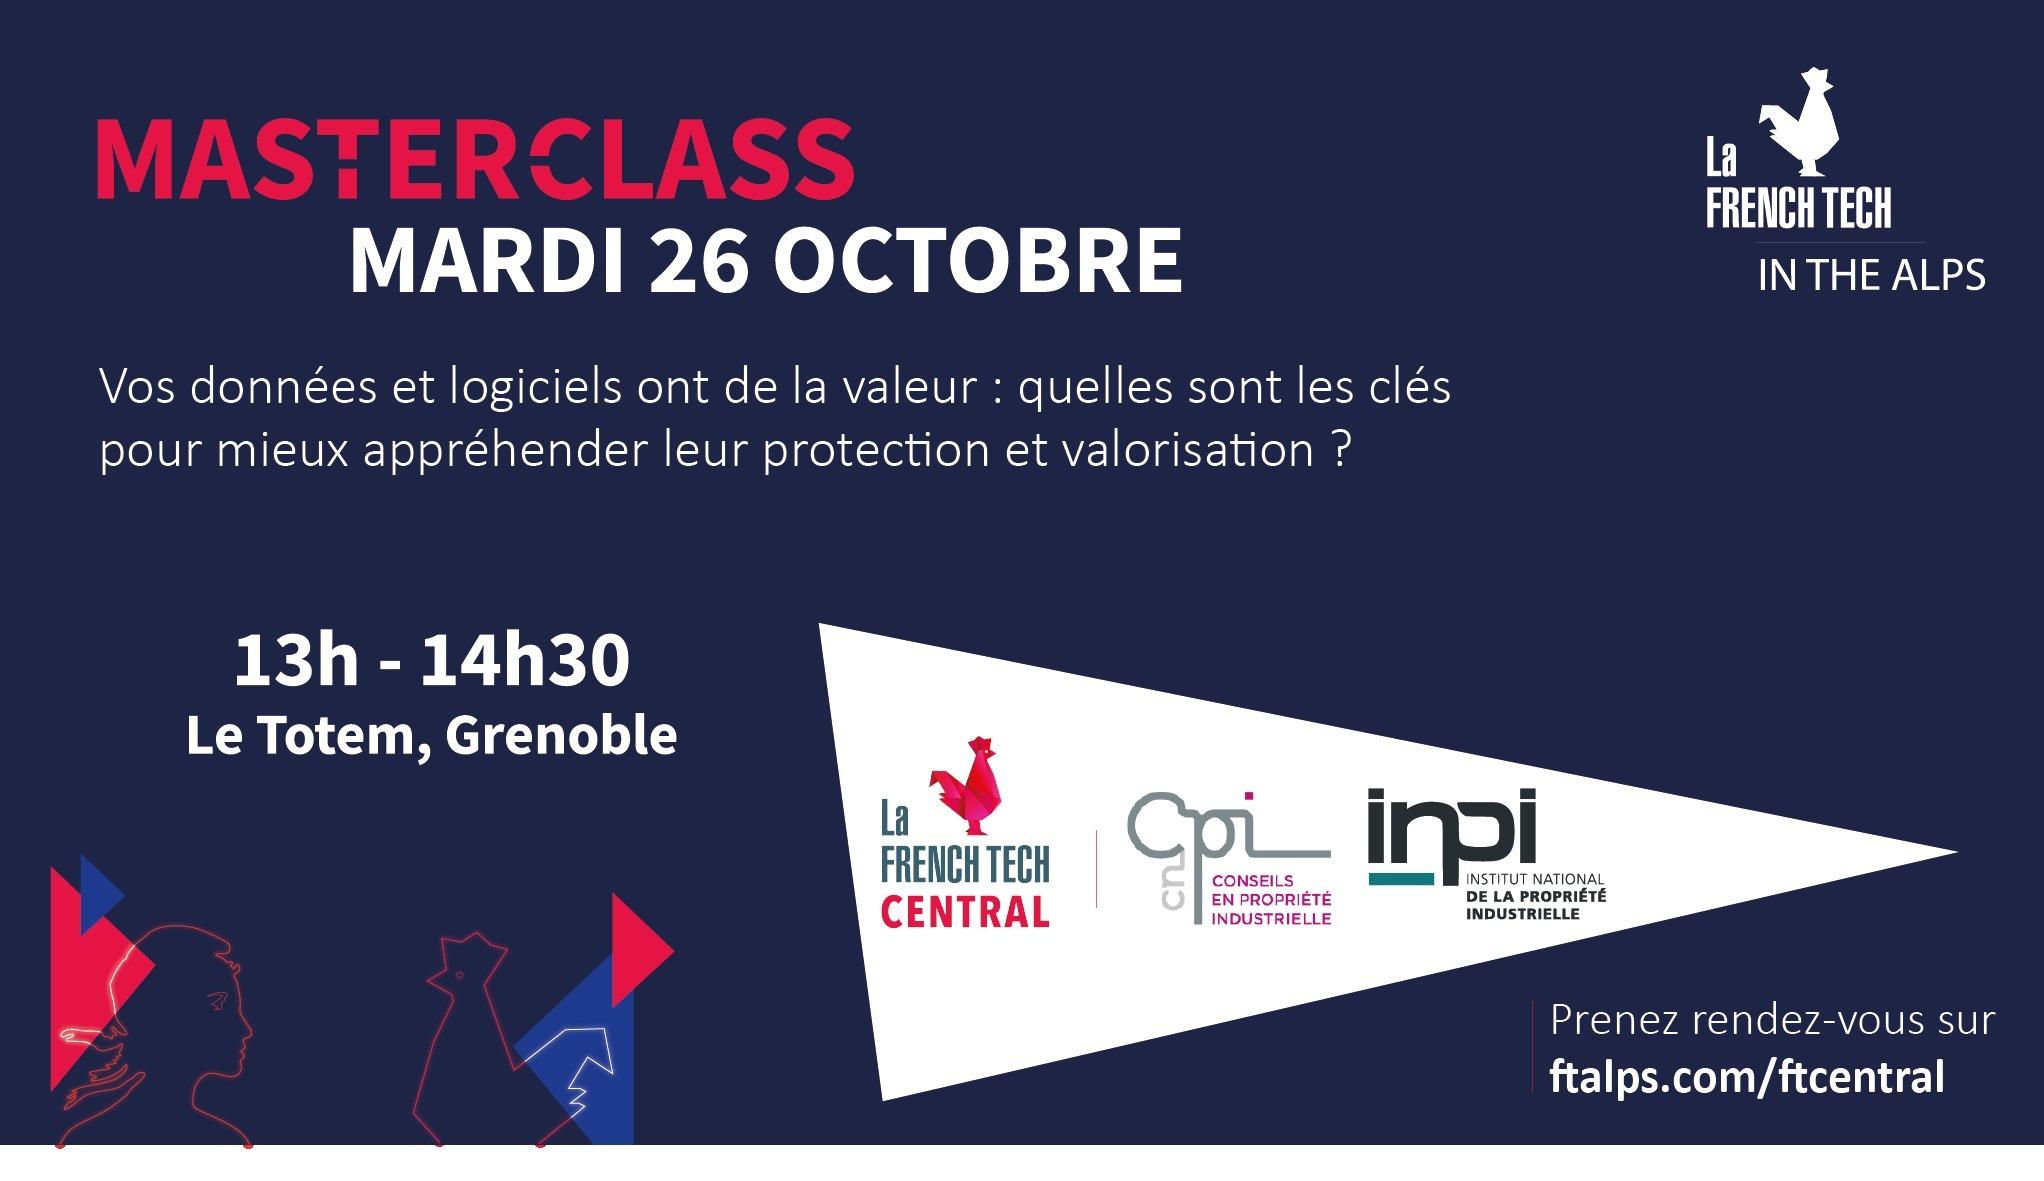 Masterclass French Tech Central x CNCPI & INPI